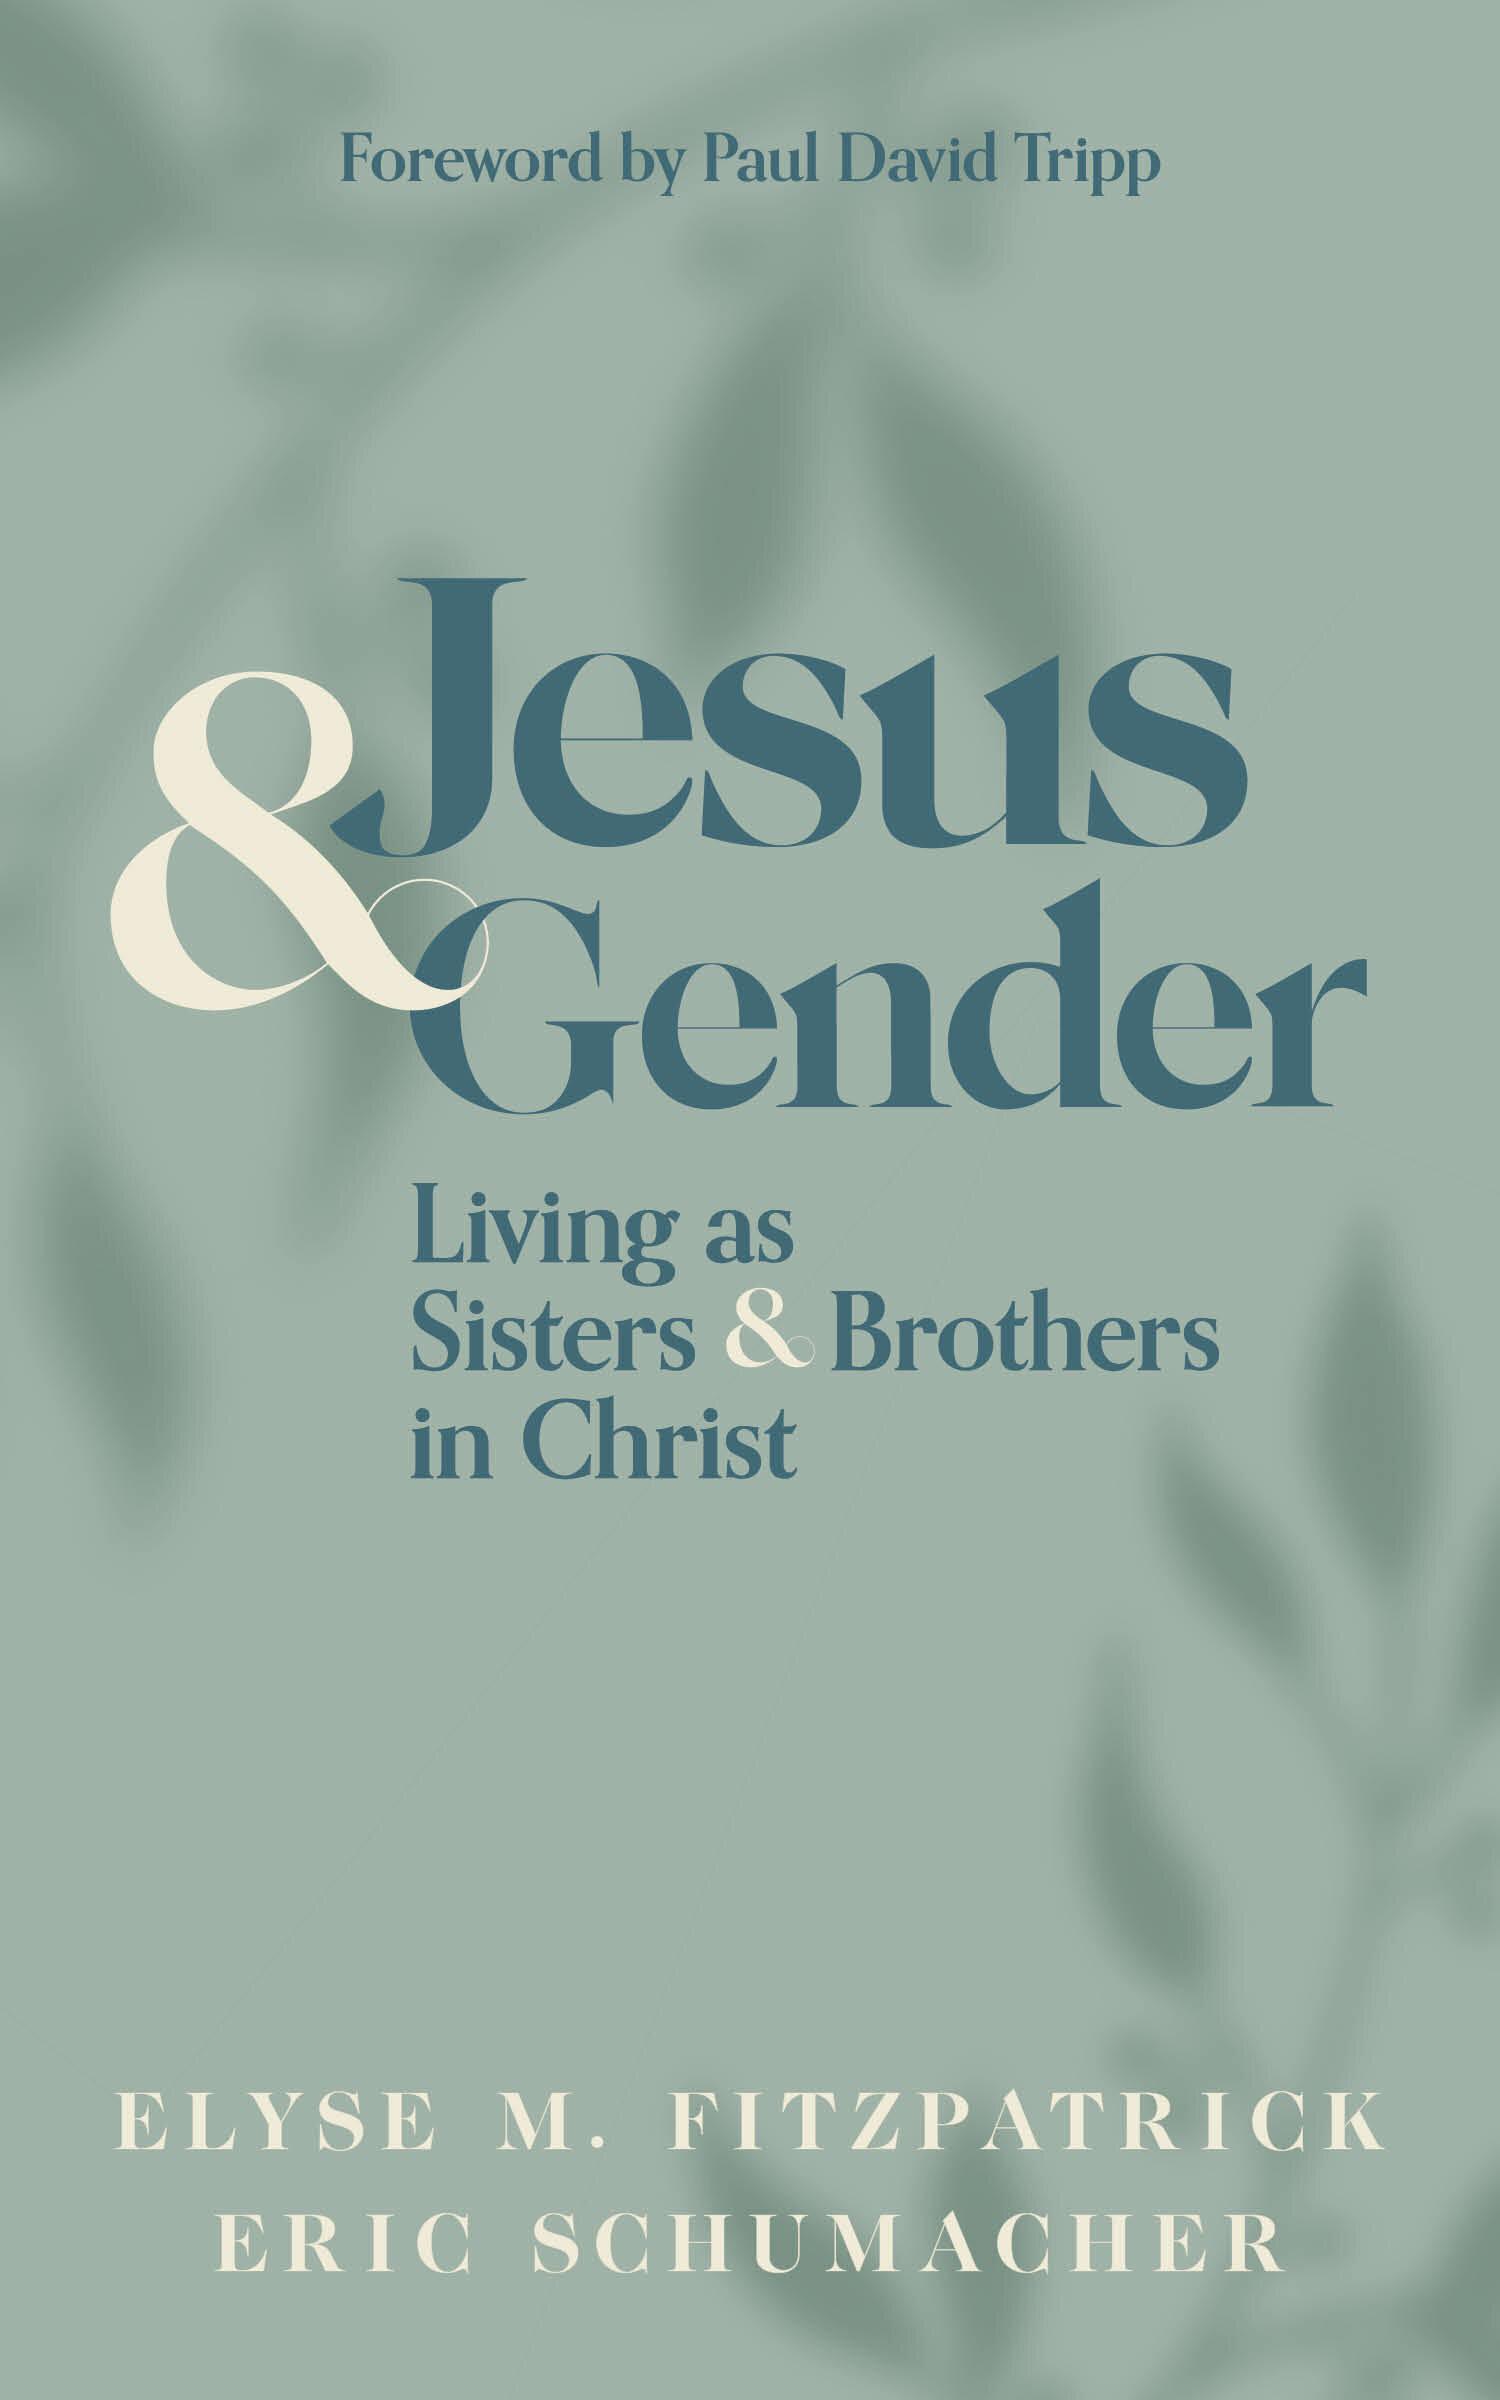 Jesus and Gender